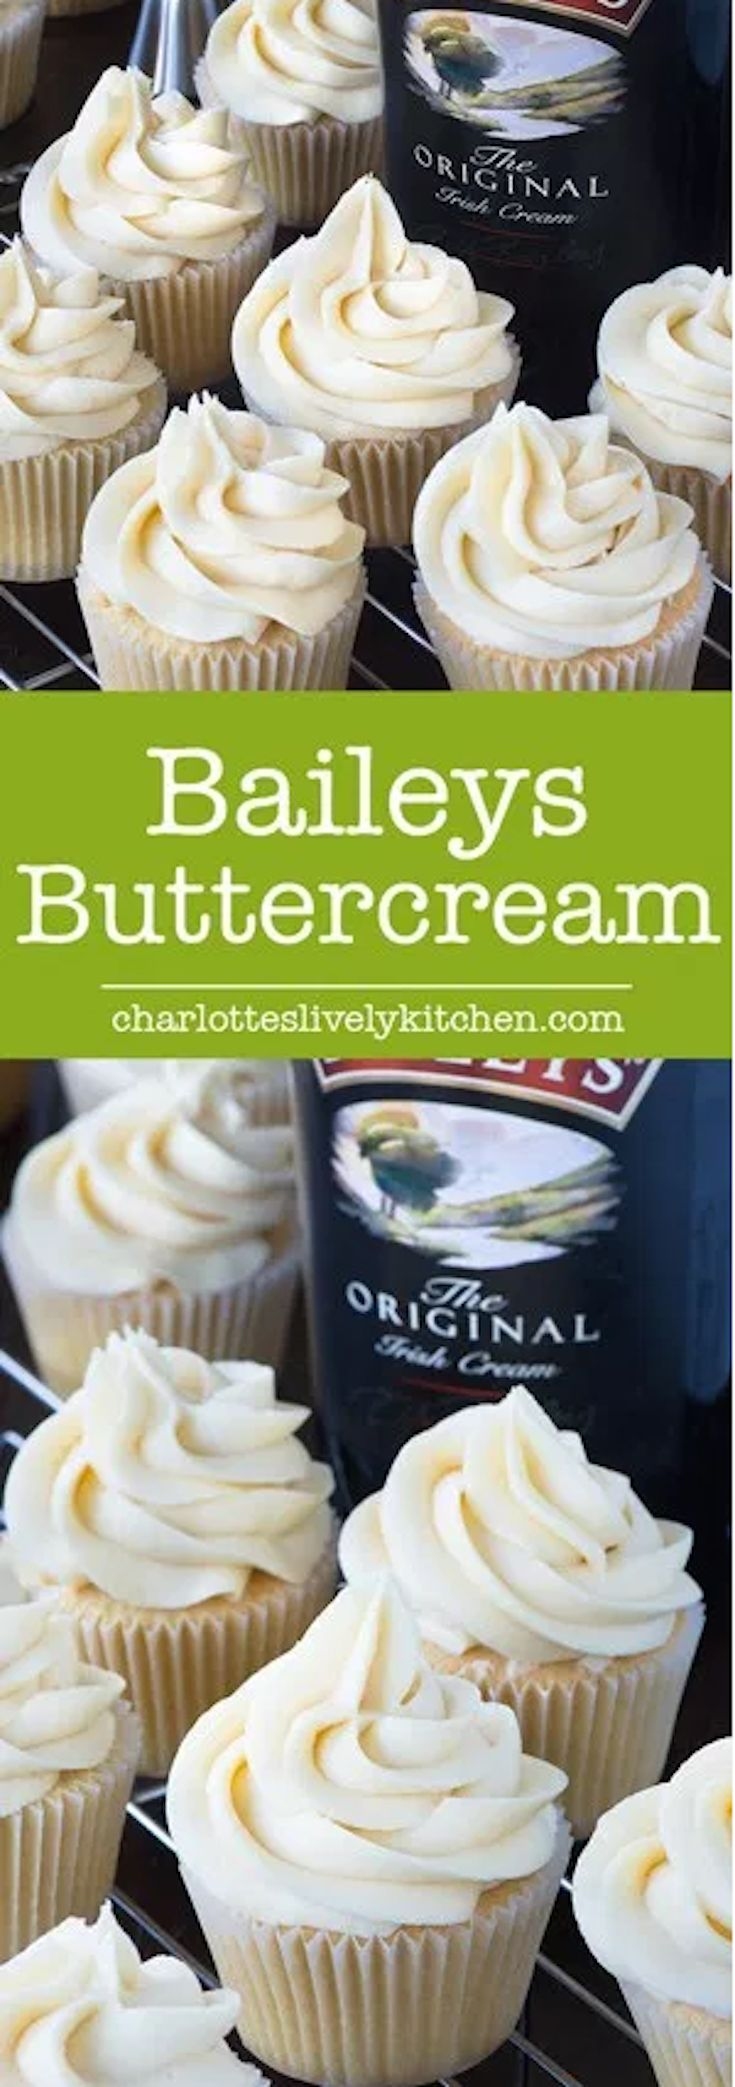 Make it! Baileys Buttercream Recipe